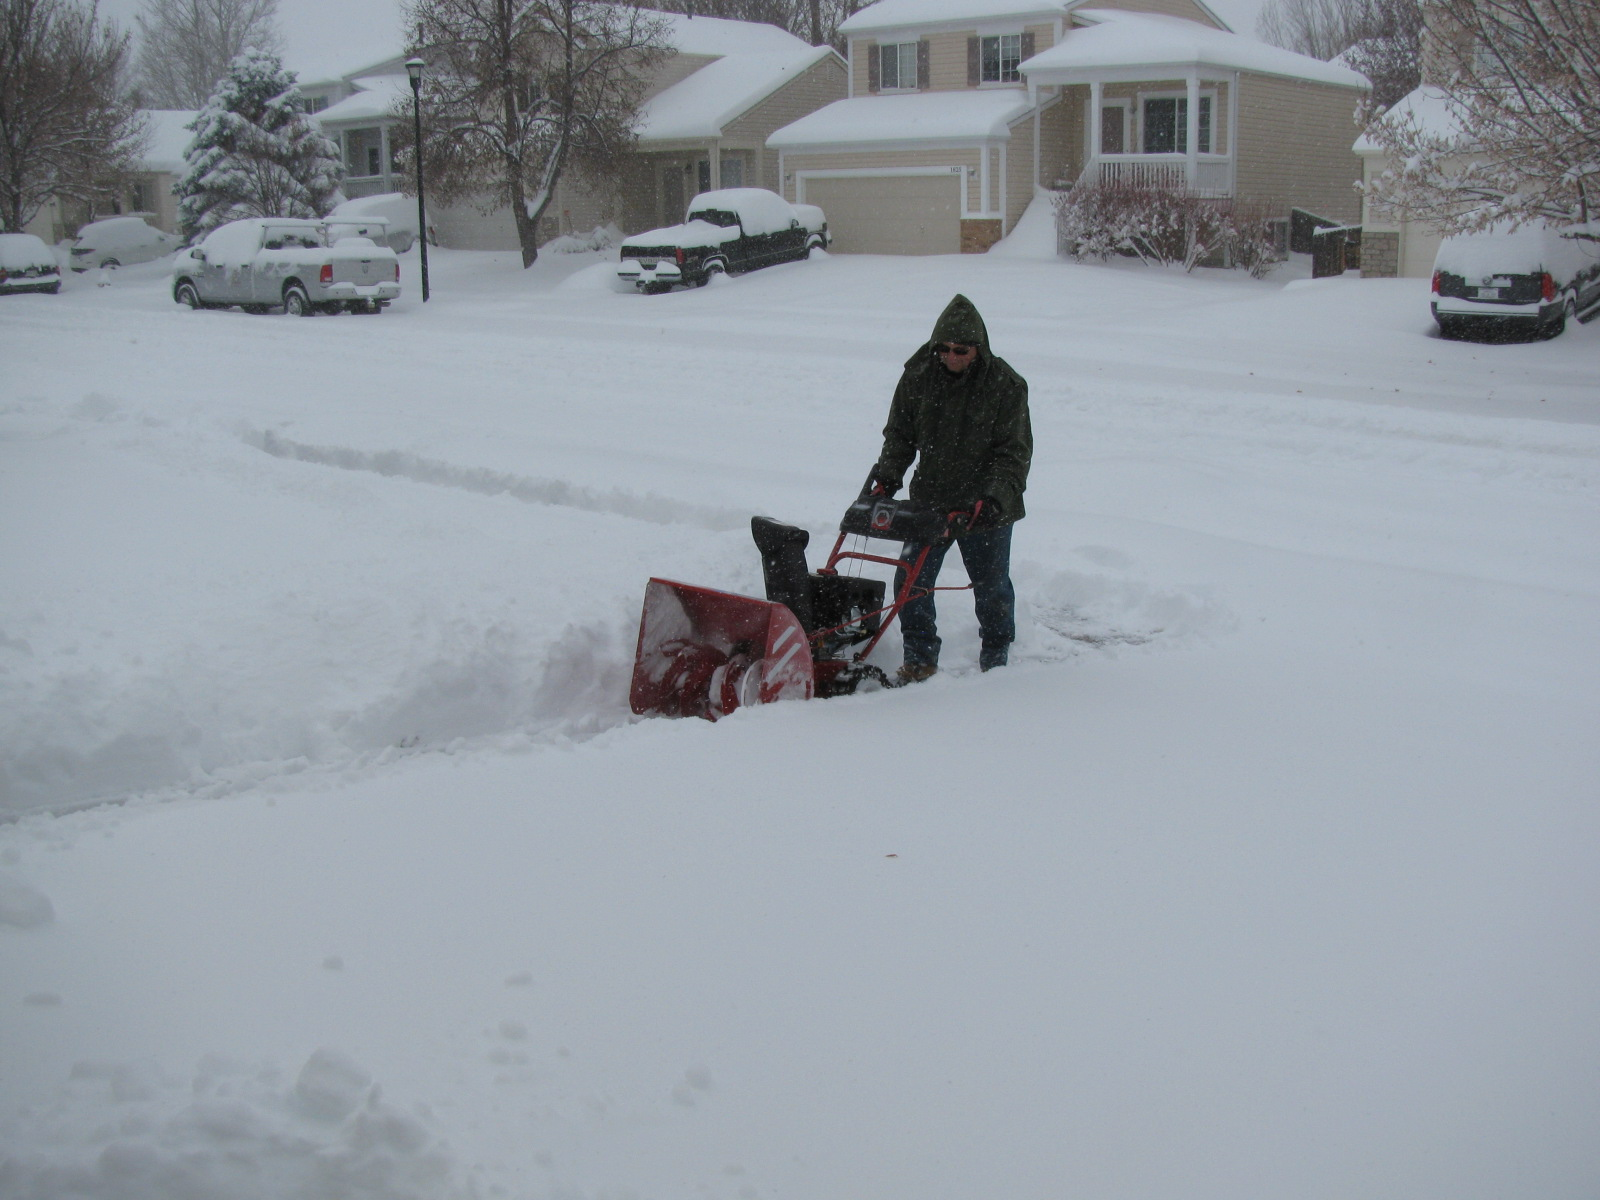 snow storm 11-25-19 006.JPG